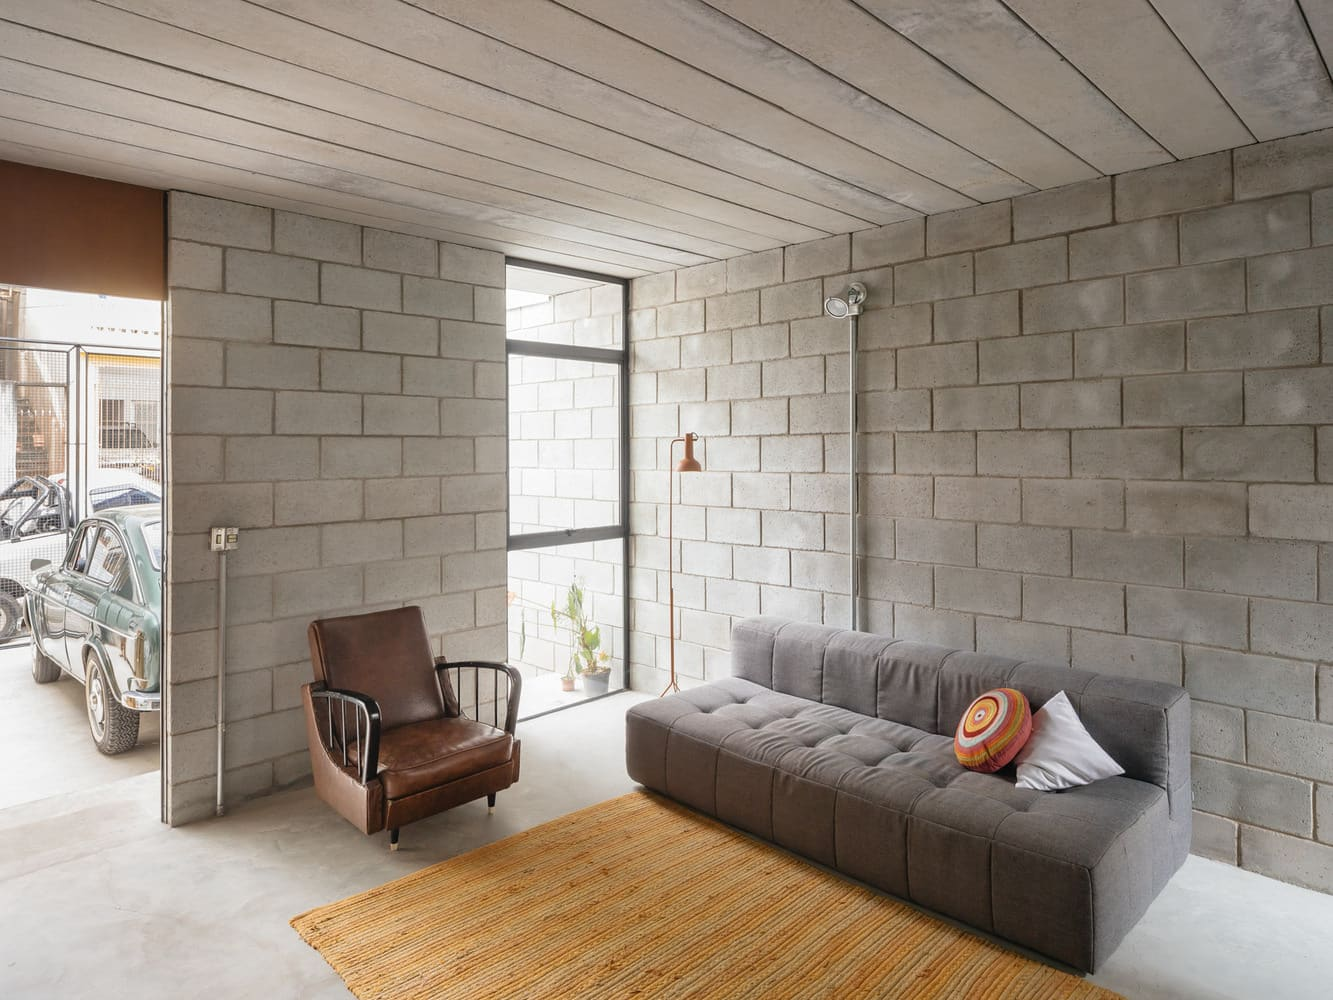 Vila Matilde House by Terra e Tuma Arquitetos Associados, Photo by Pedro Kok n